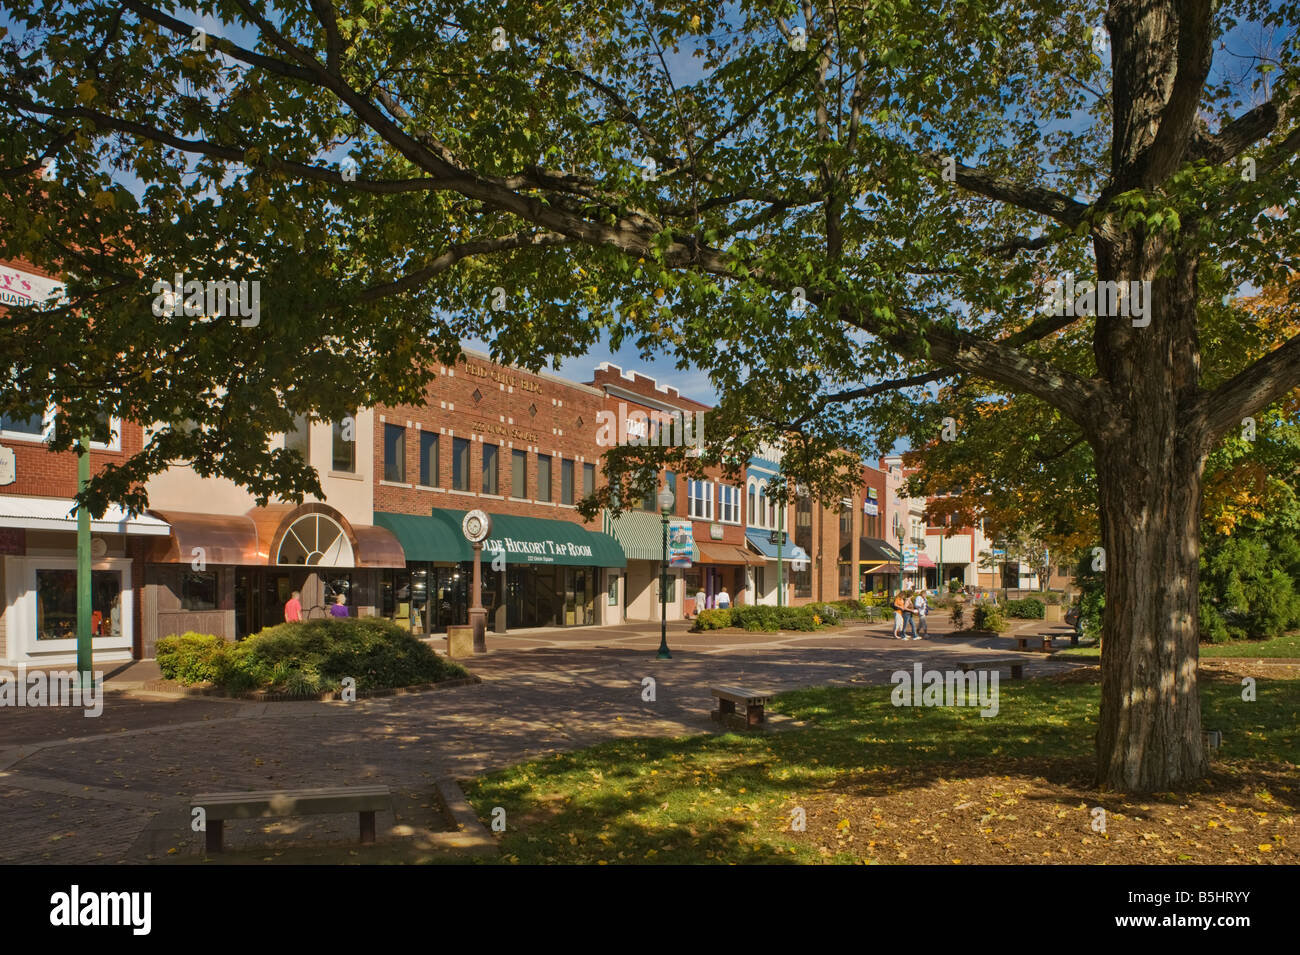 Union Square, Hickory, North Carolina, USA - Stock Image